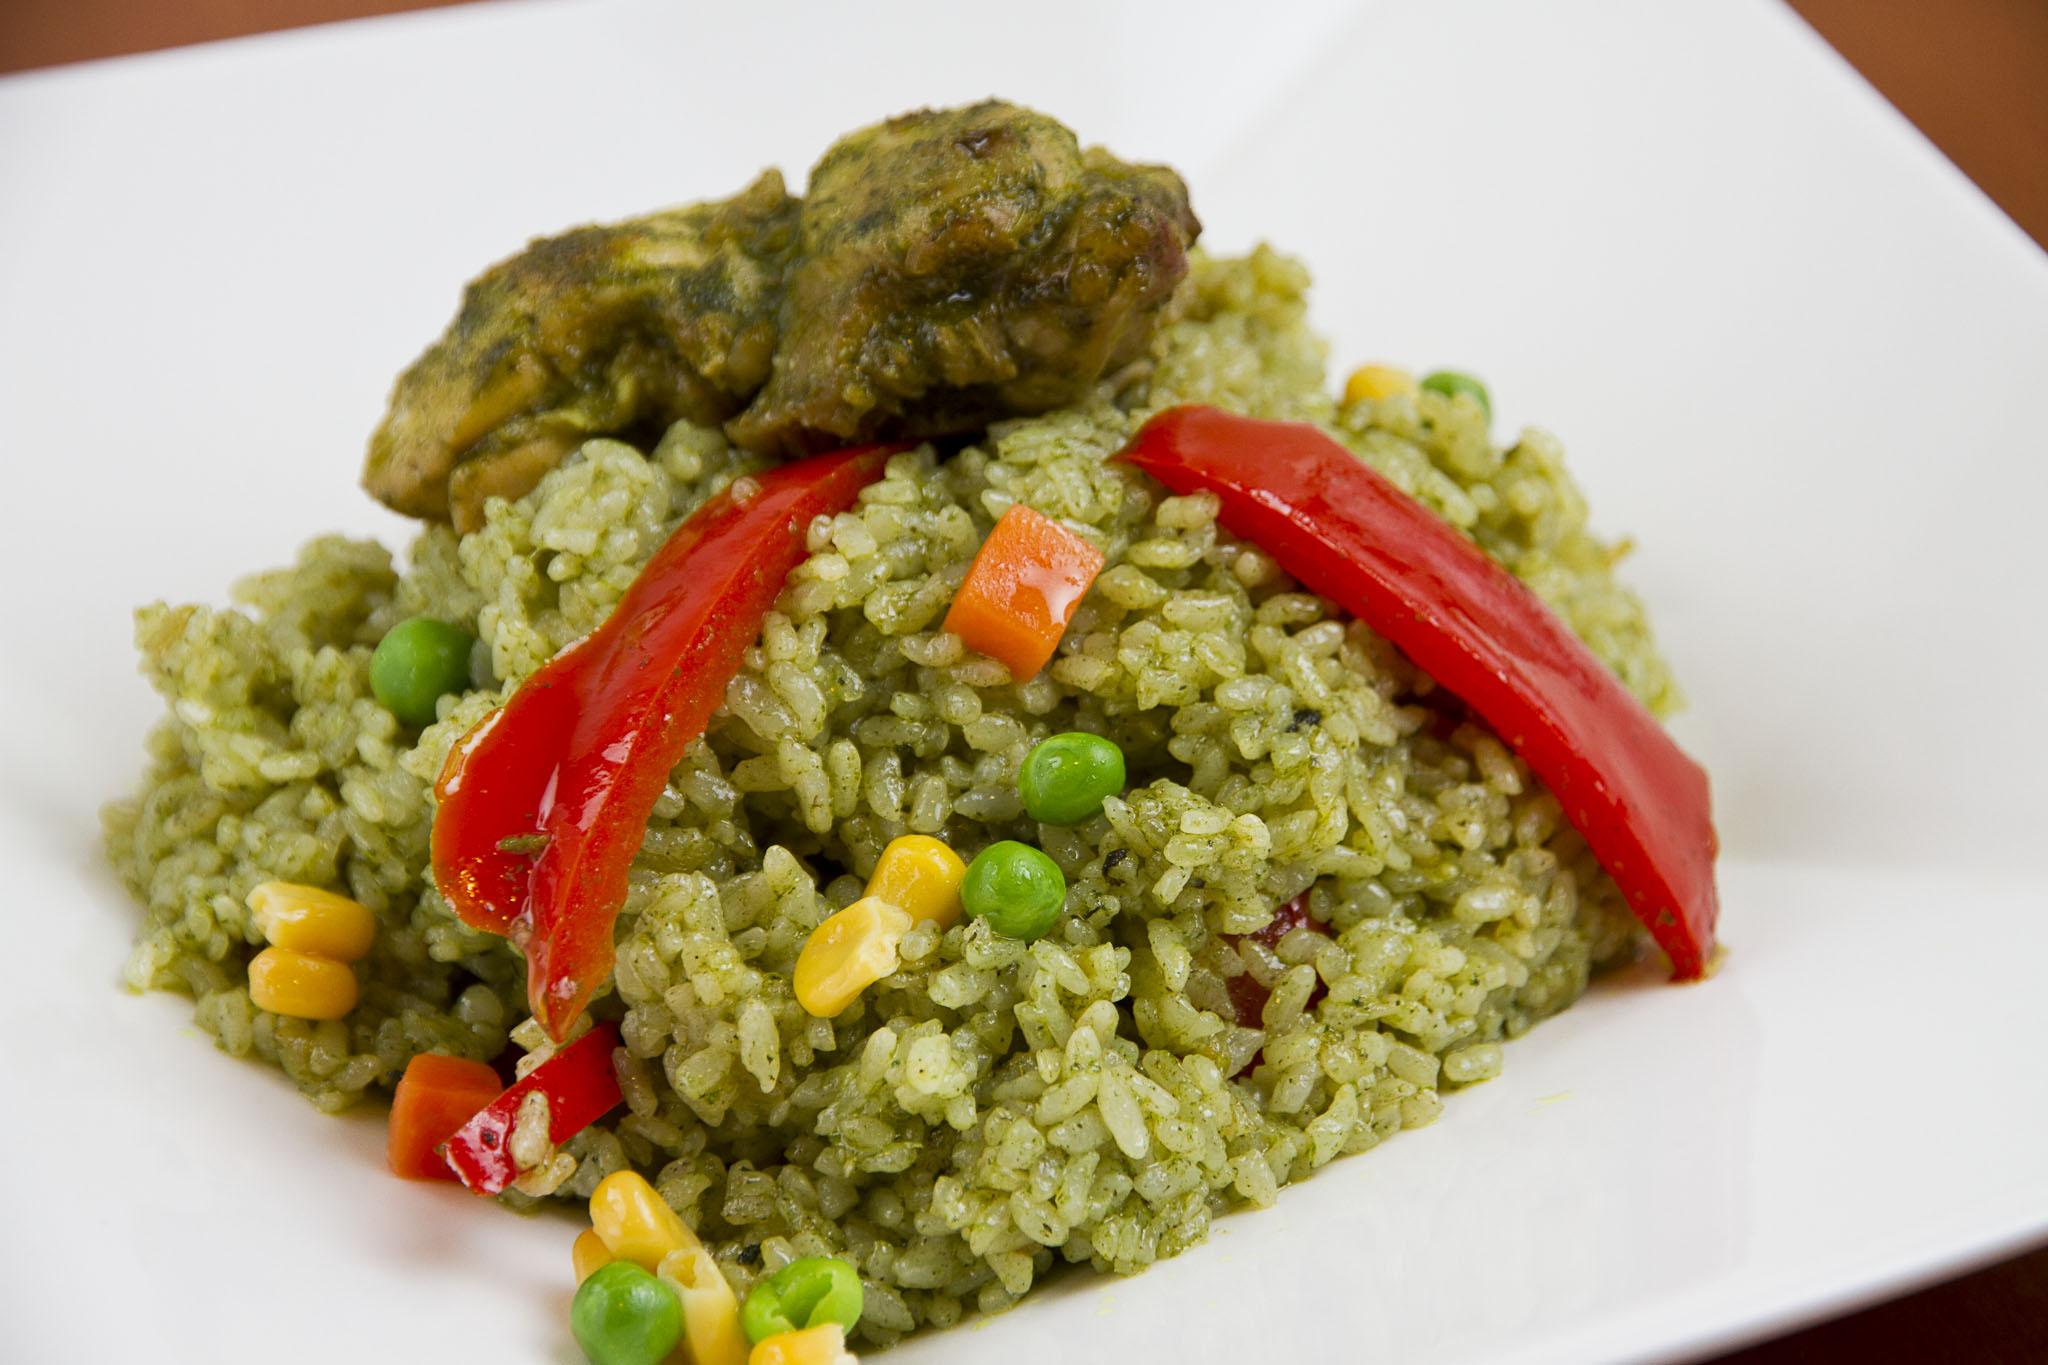 ... on chorizo receta de arroz con pollo arroz con pollo arroz con pollo